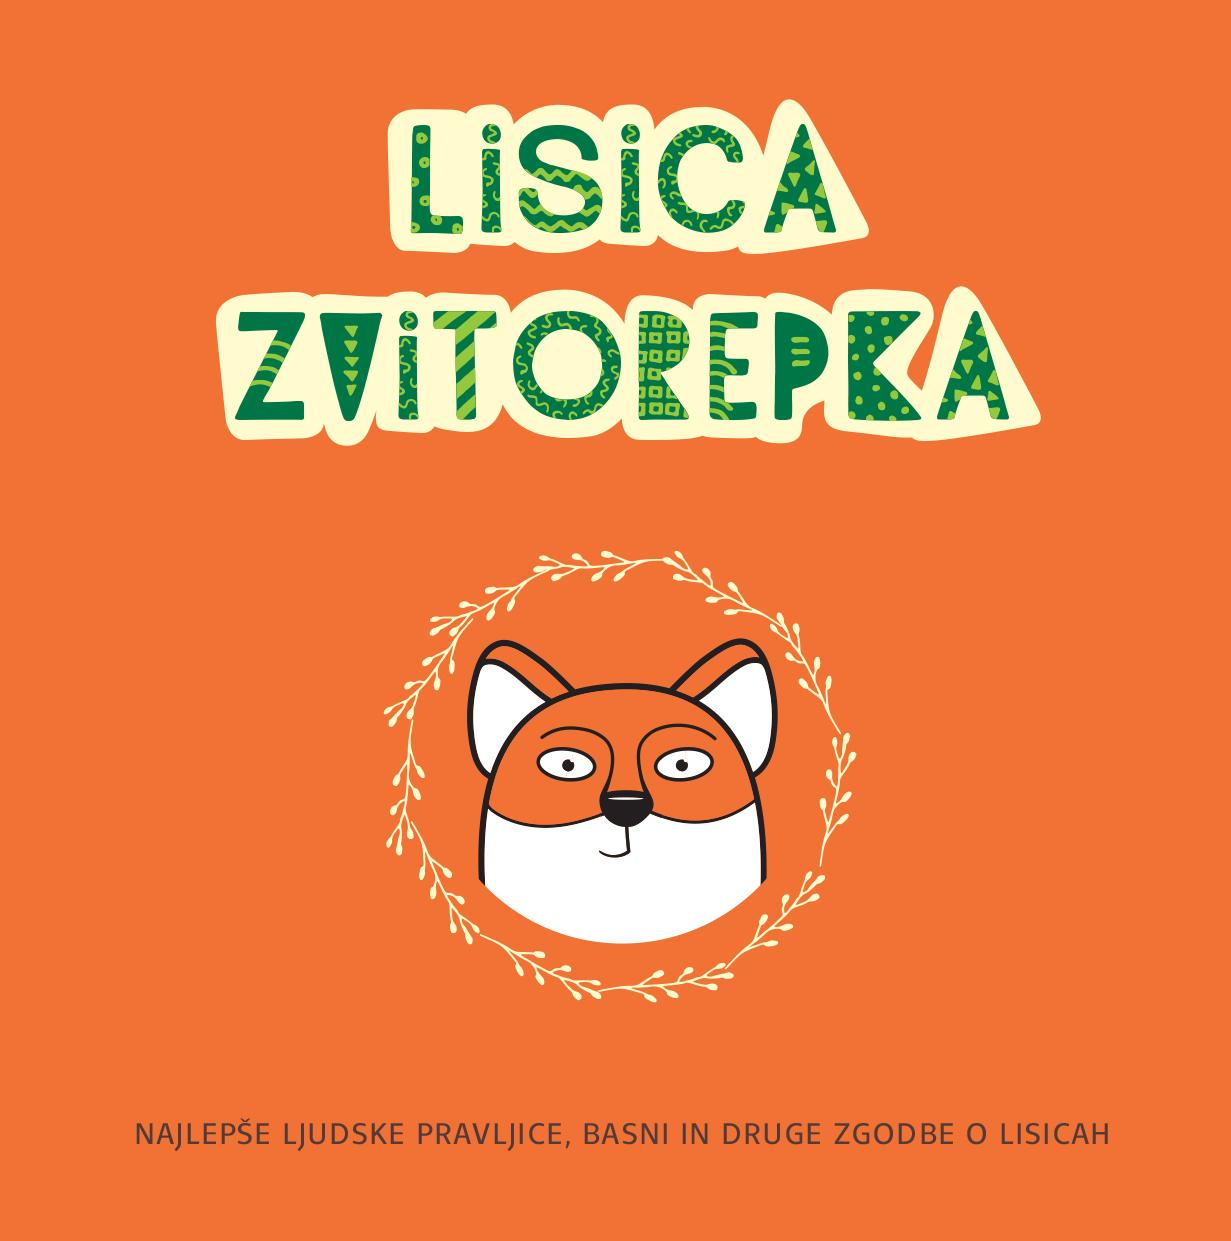 Lisica Zvitorepka-naslovnica1.indd